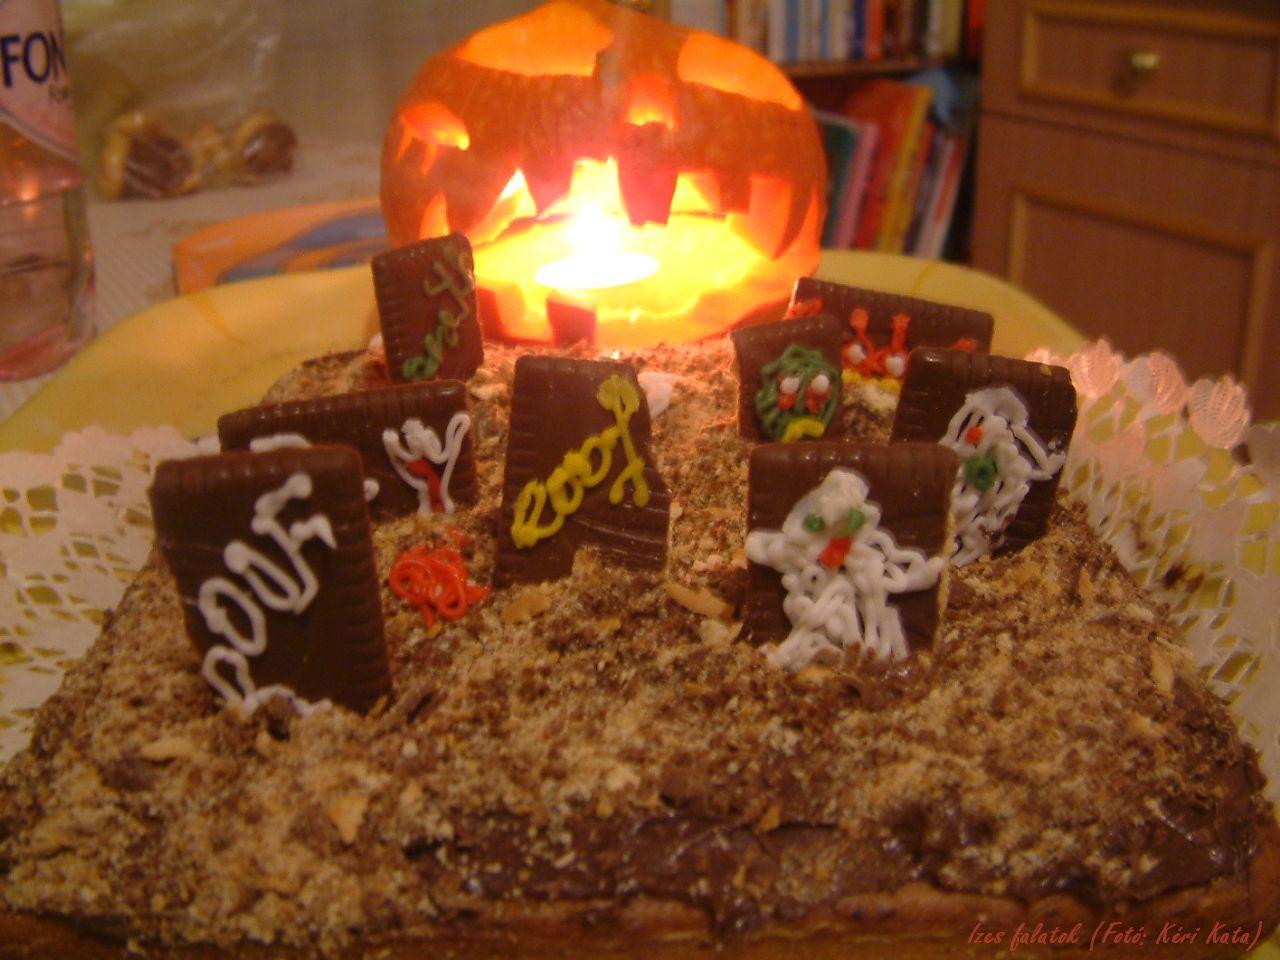 Diós-csokis süti Halloweenre (Fotó: Kéri Kata)